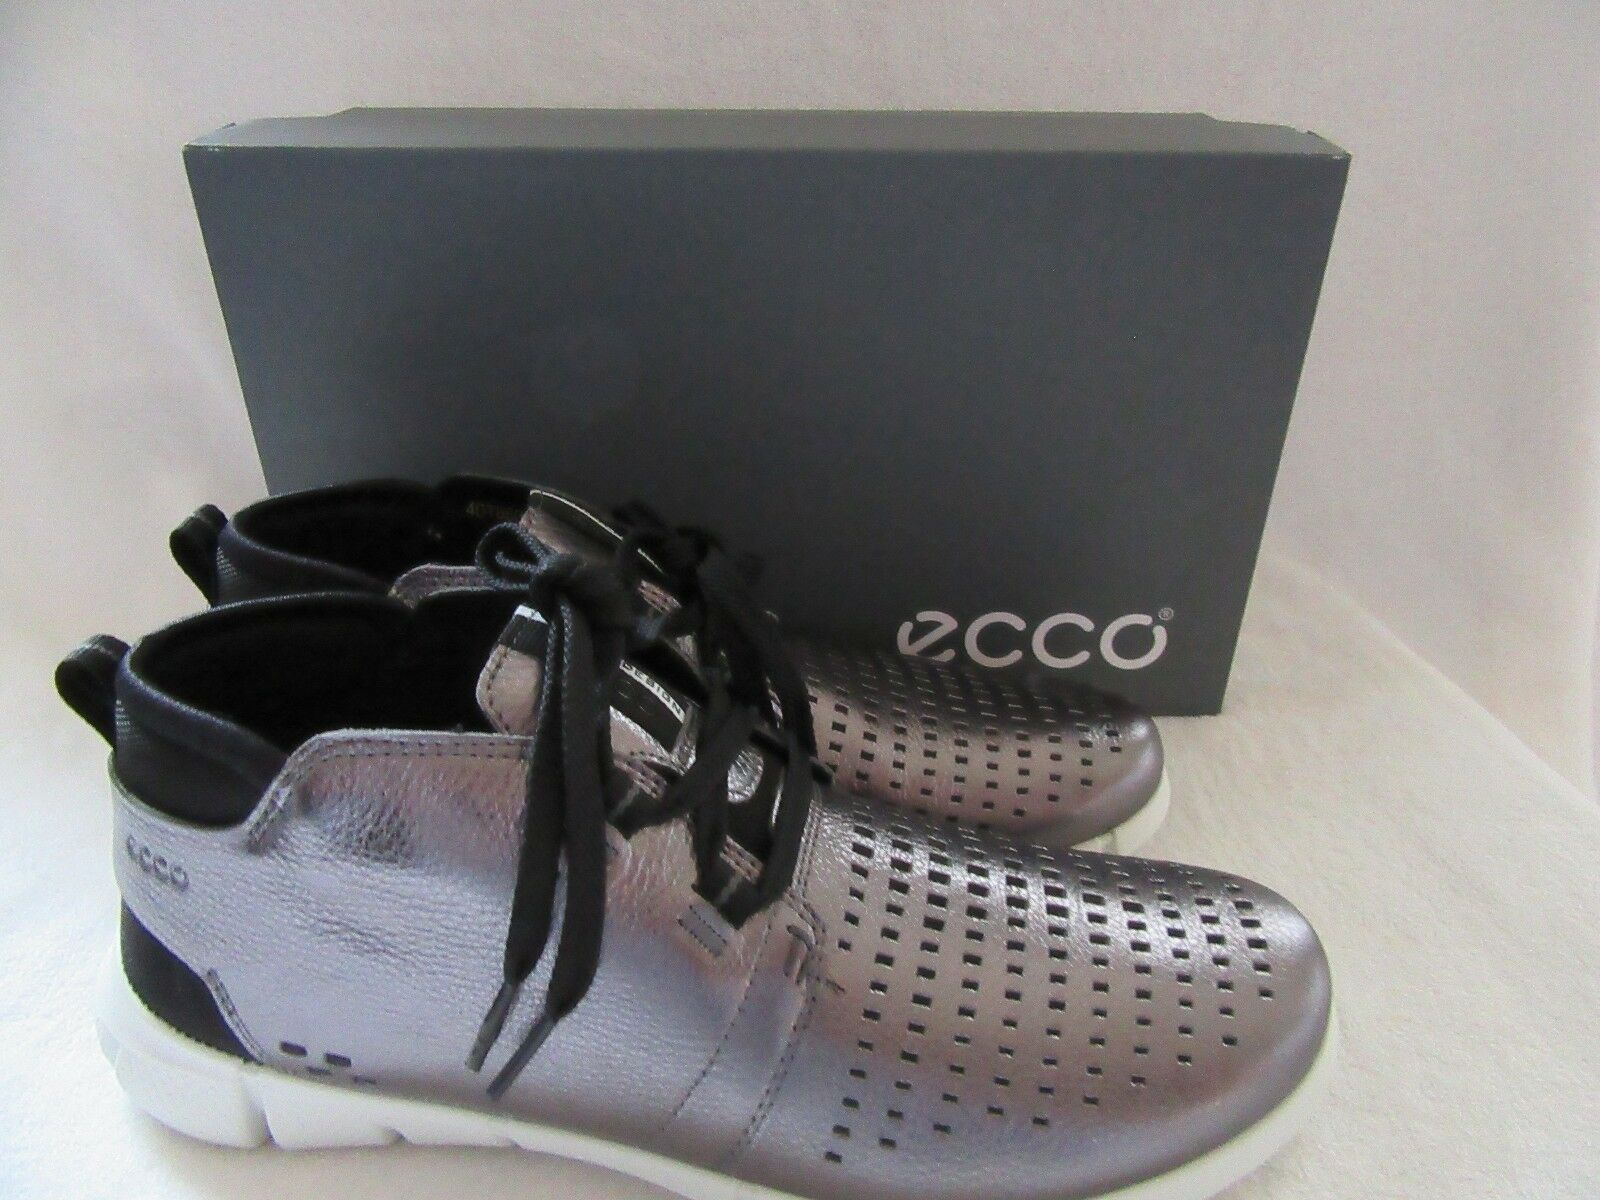 ECCO Intrinsic Dark Shadow Metallic Chukka Leather Shoes US 9 - 9.5 NWB